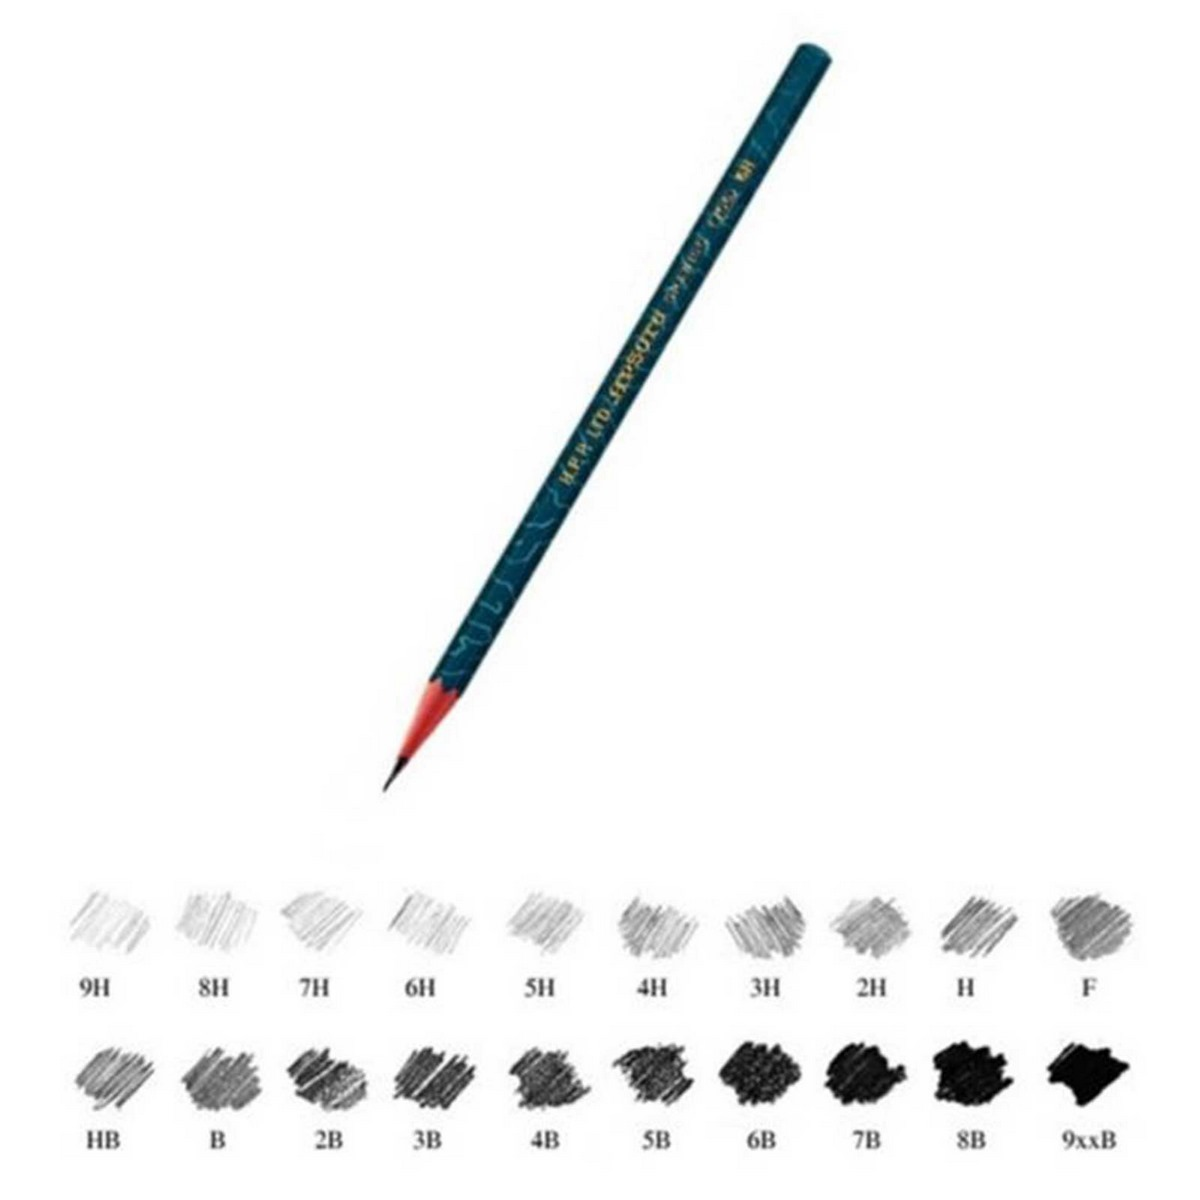 Apsara Drawing Pencils (Lead Size: 2B) Black 101209003